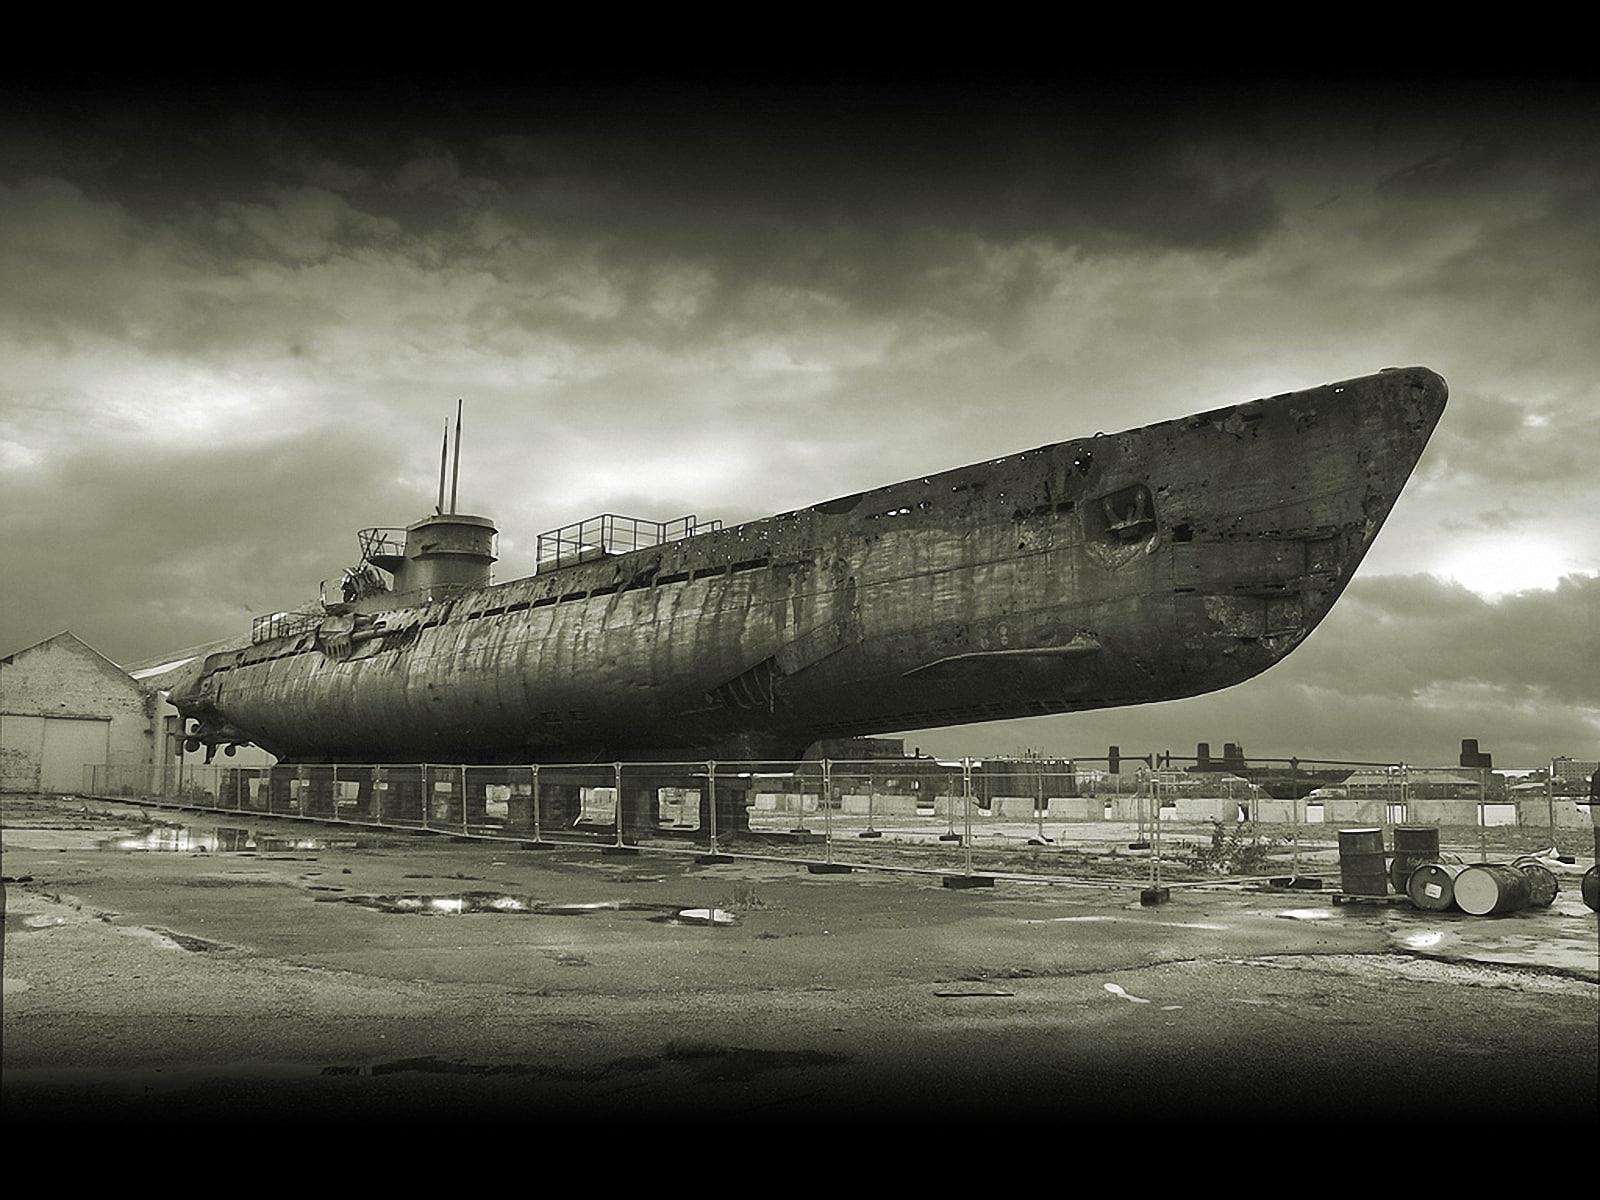 hd wallpaper: u-boat, schematic, blueprints, submarine, type